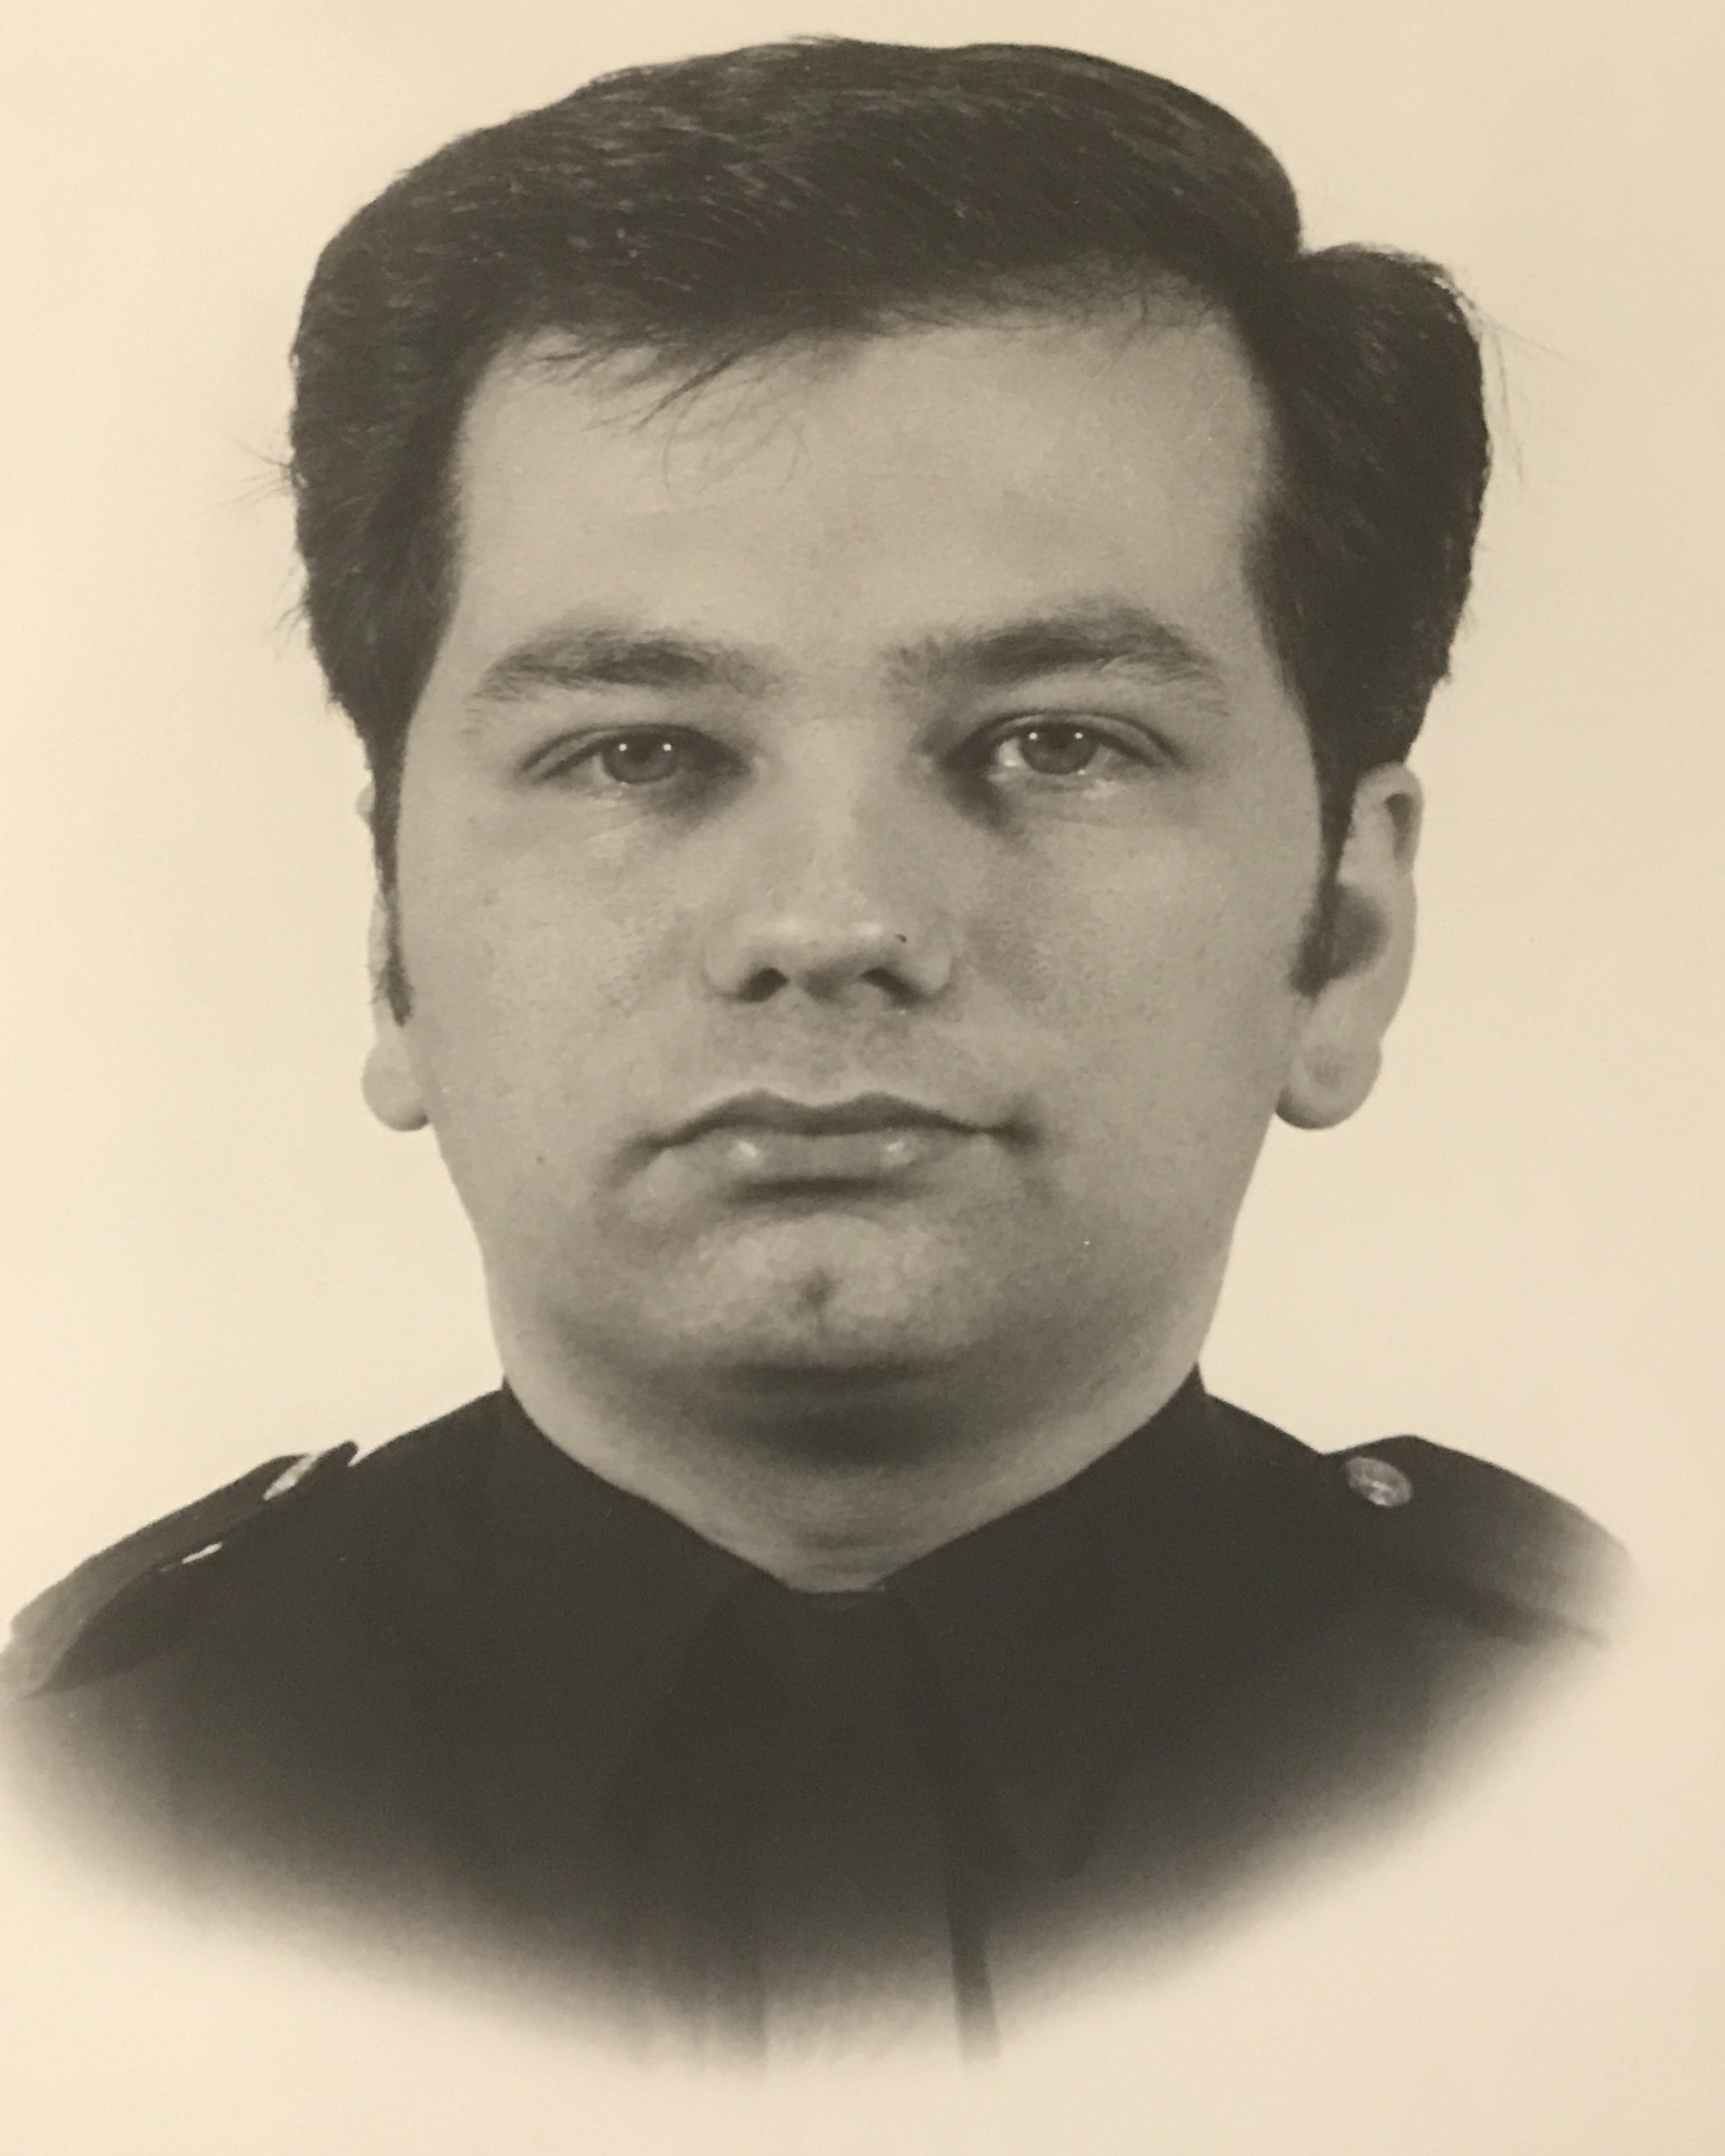 Patrolman Michael J. Reedy | Orangetown Police Department, New York